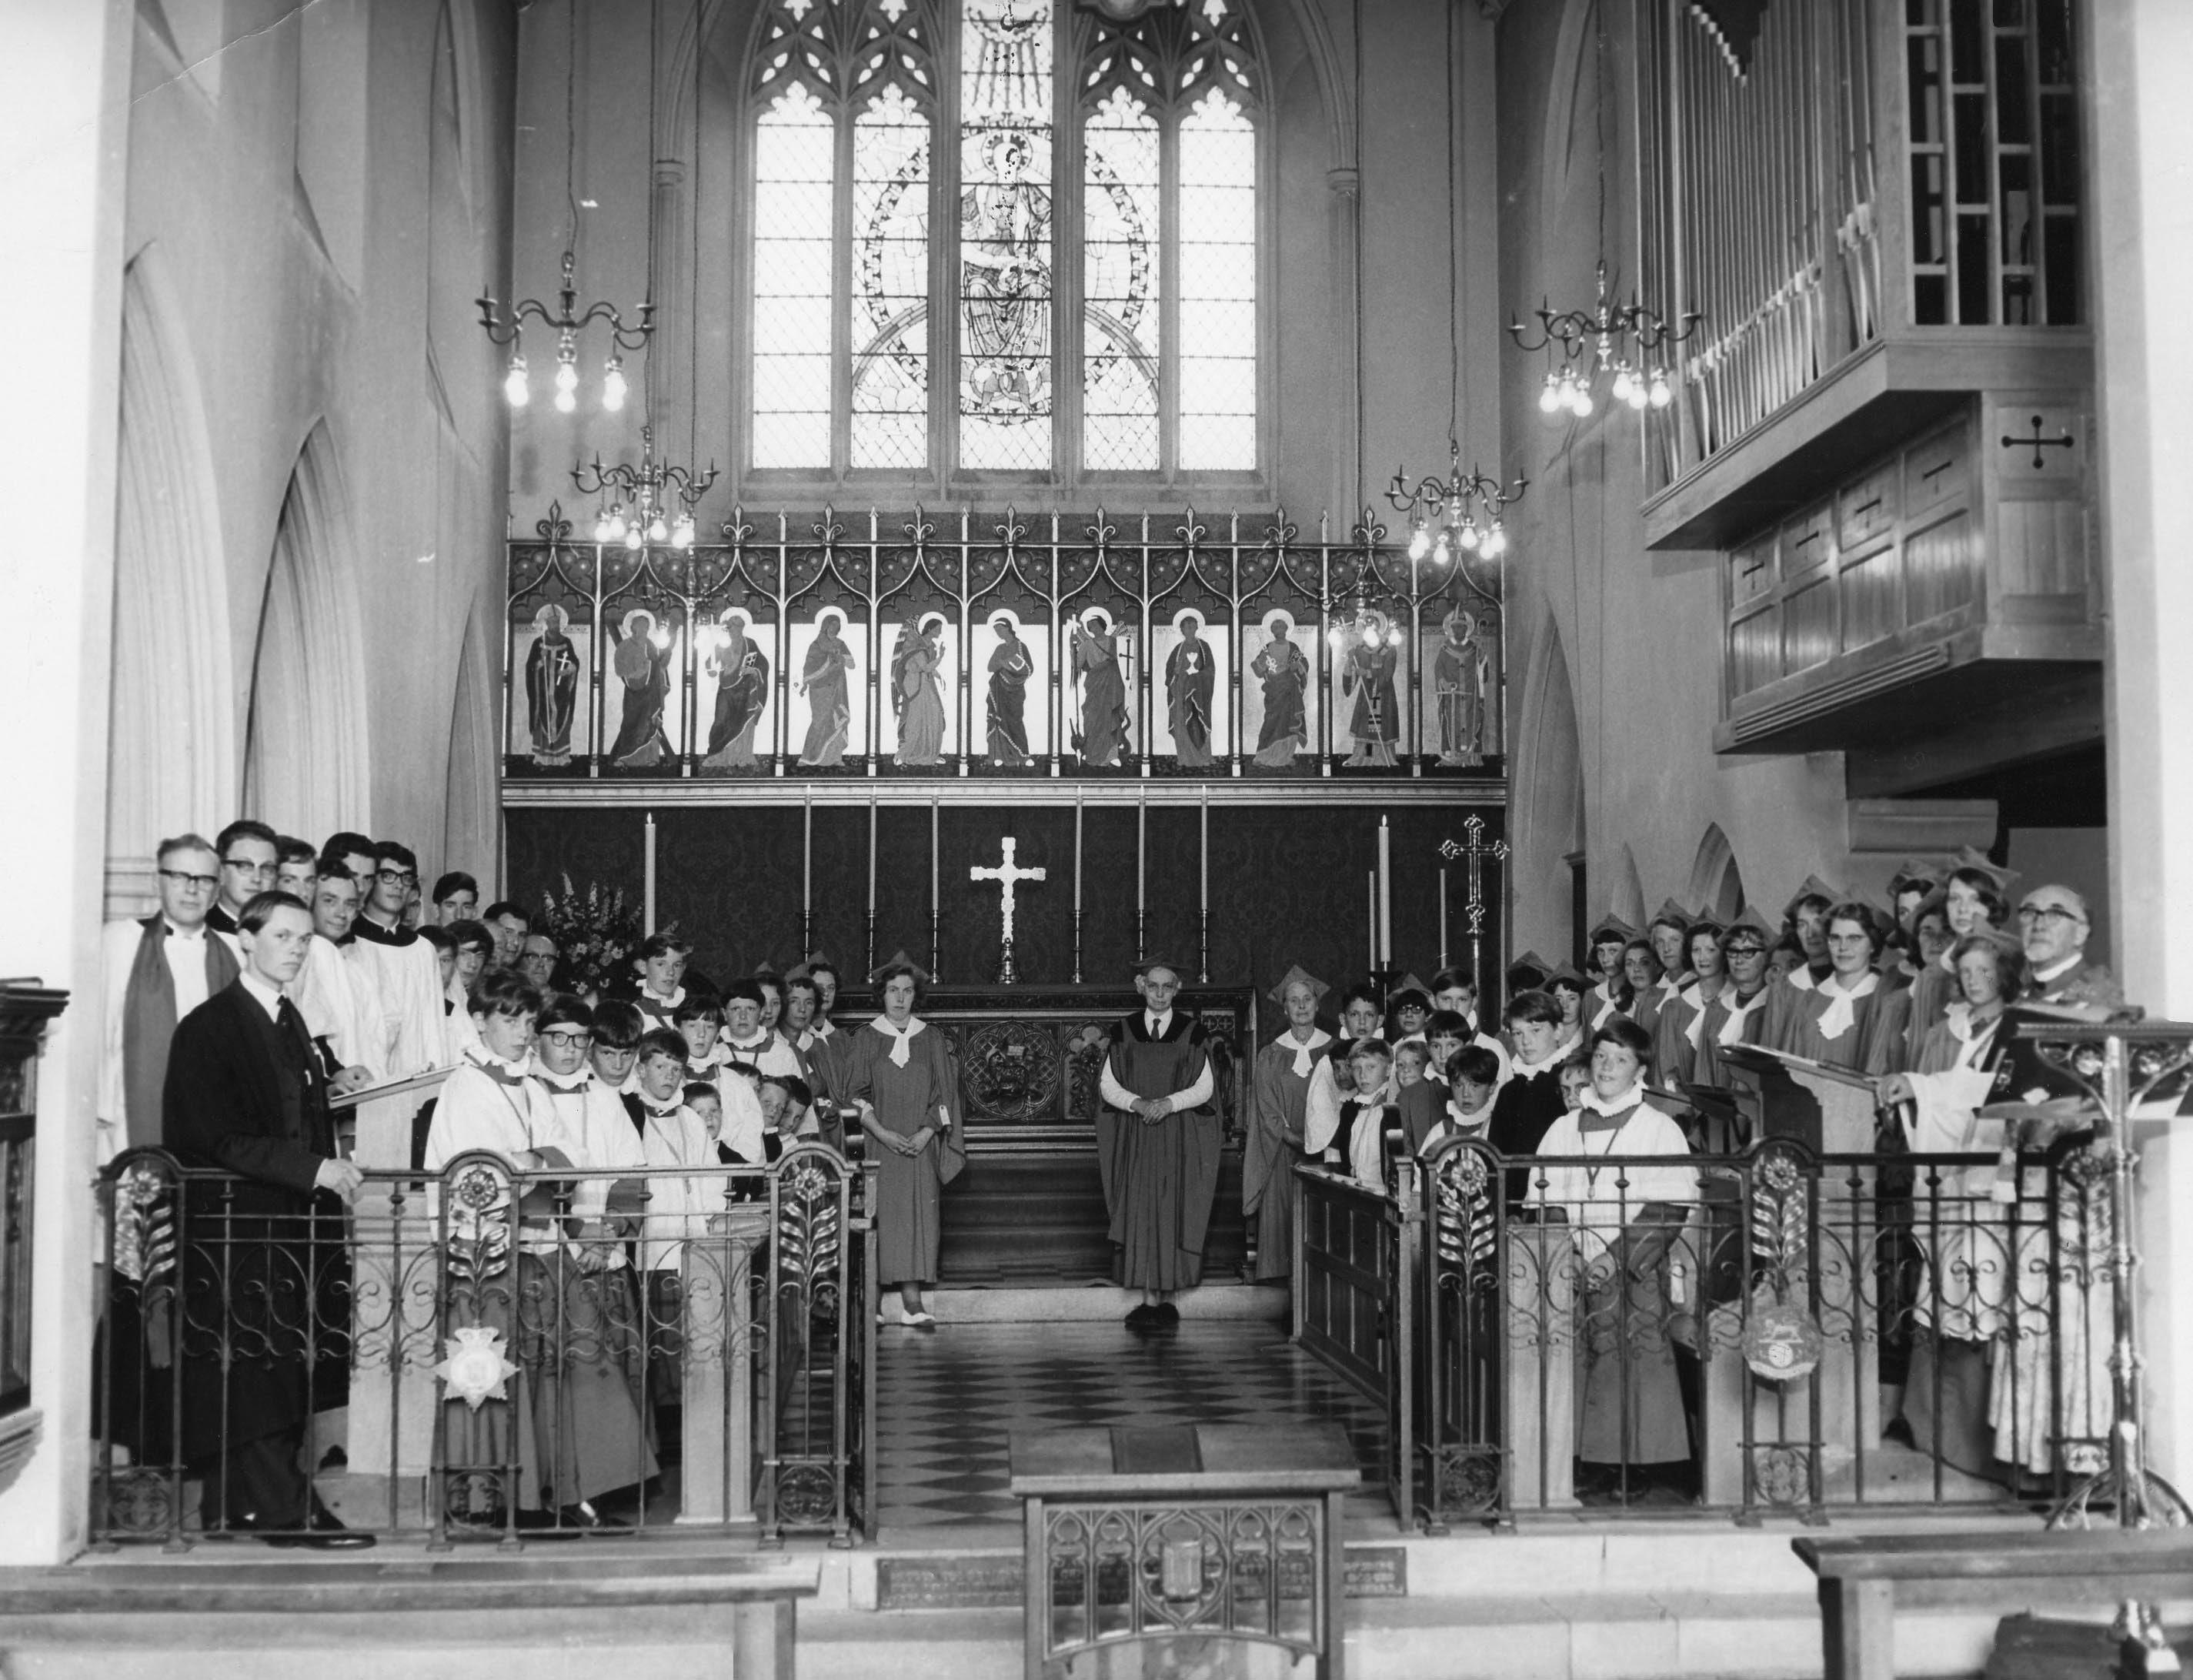 Full Choirstalls 1966